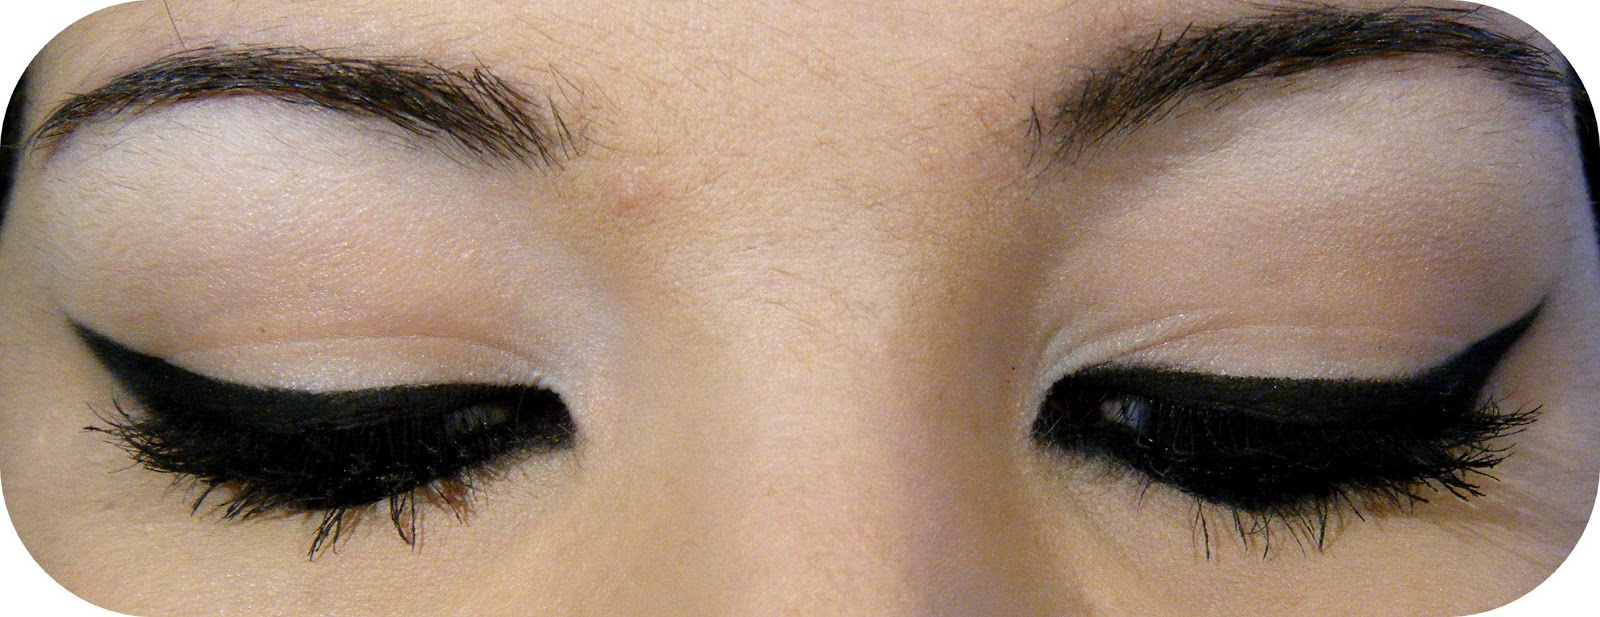 tuto maquillage oeil de chat